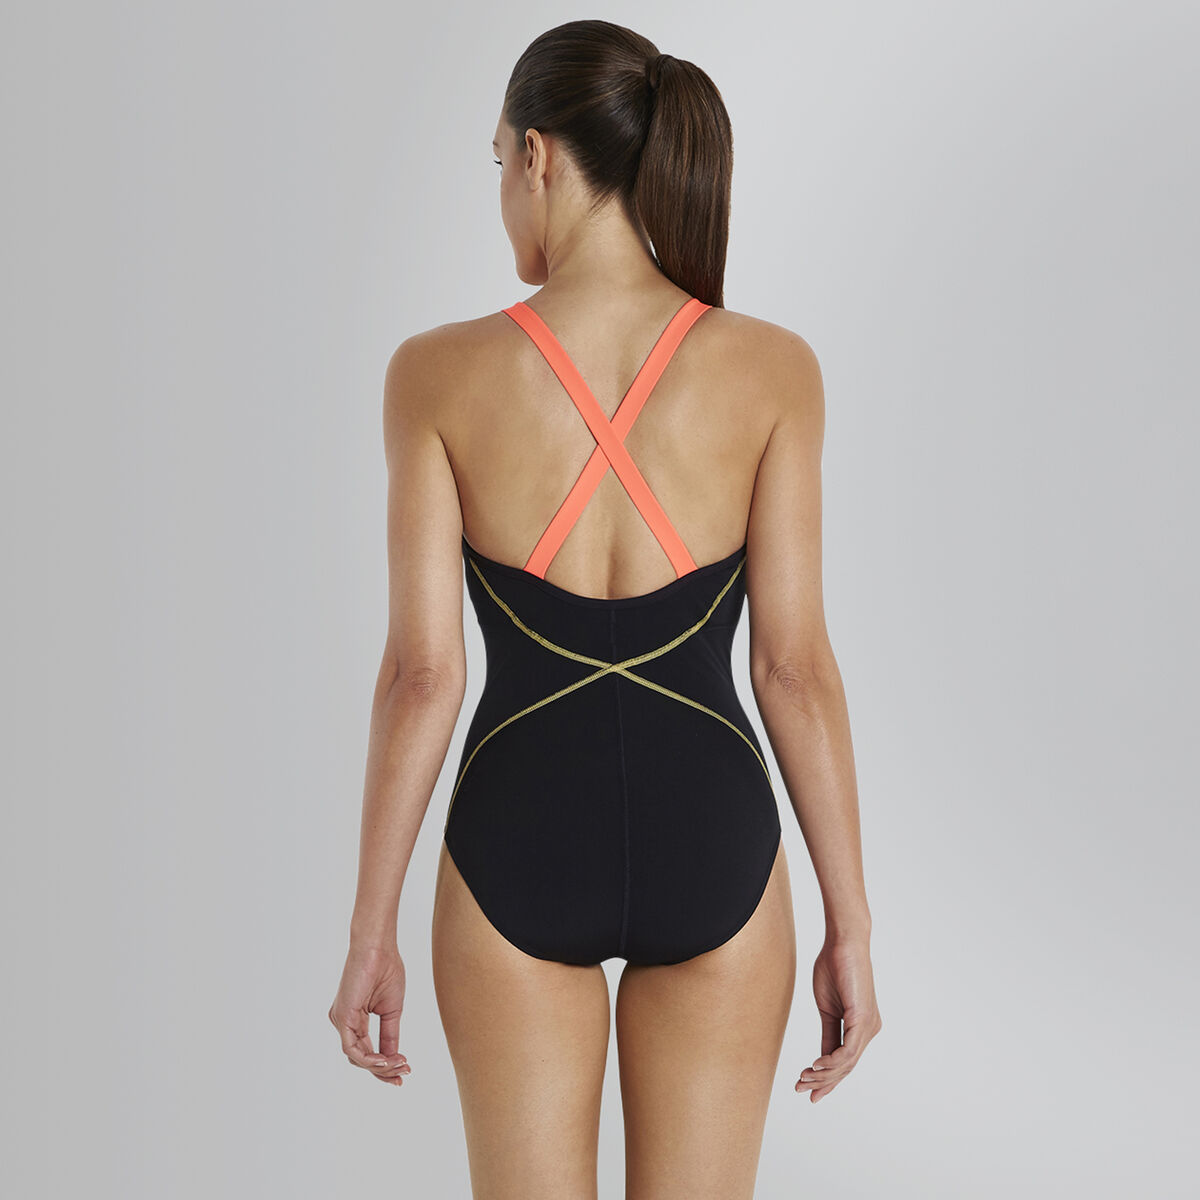 Speedo Fit Pinnacle Crossback Swimsuit Swimsuit